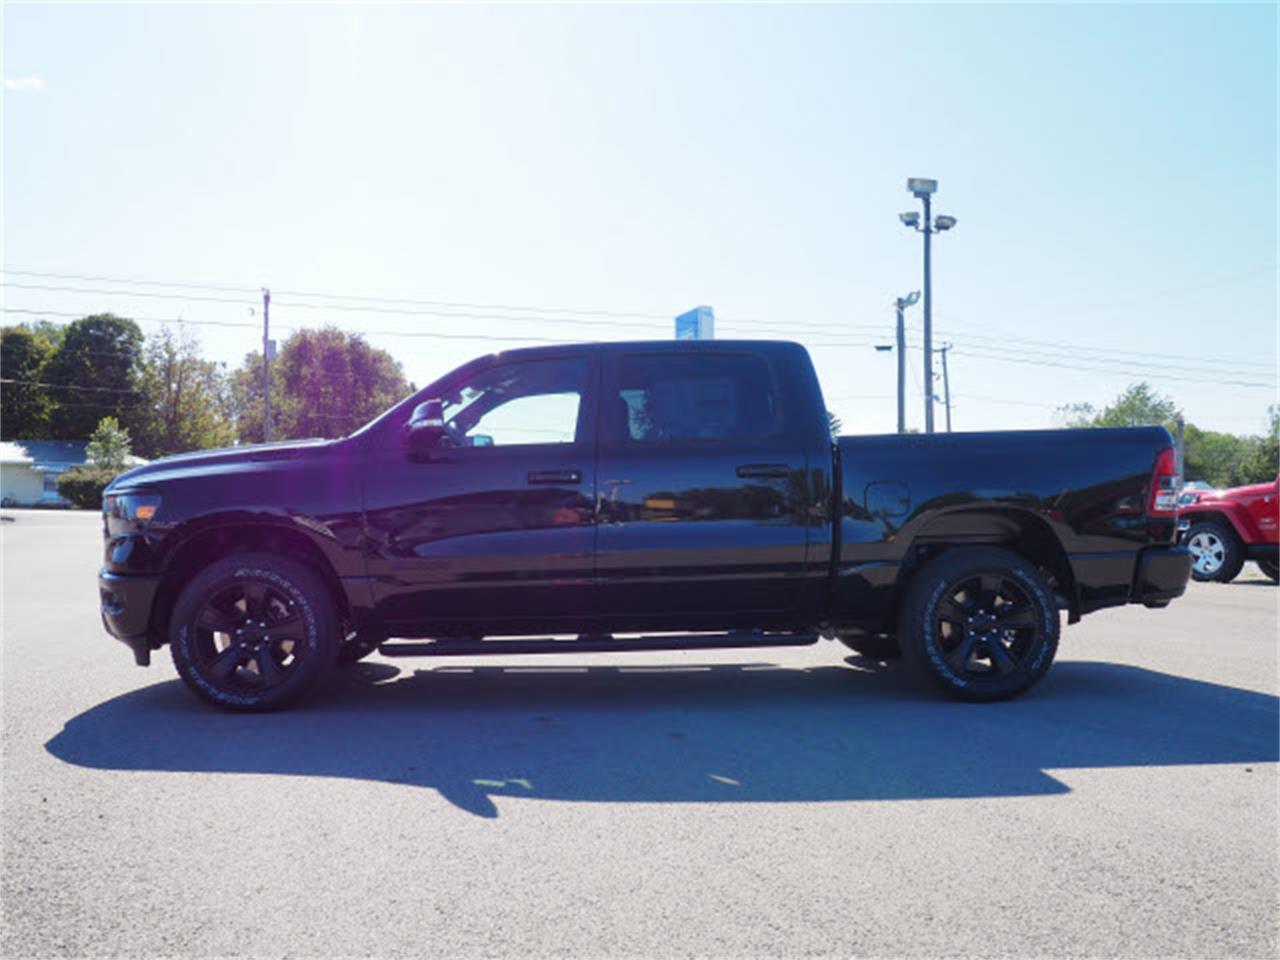 2020 Dodge Ram 1500 (CC-1327553) for sale in Marysville, Ohio